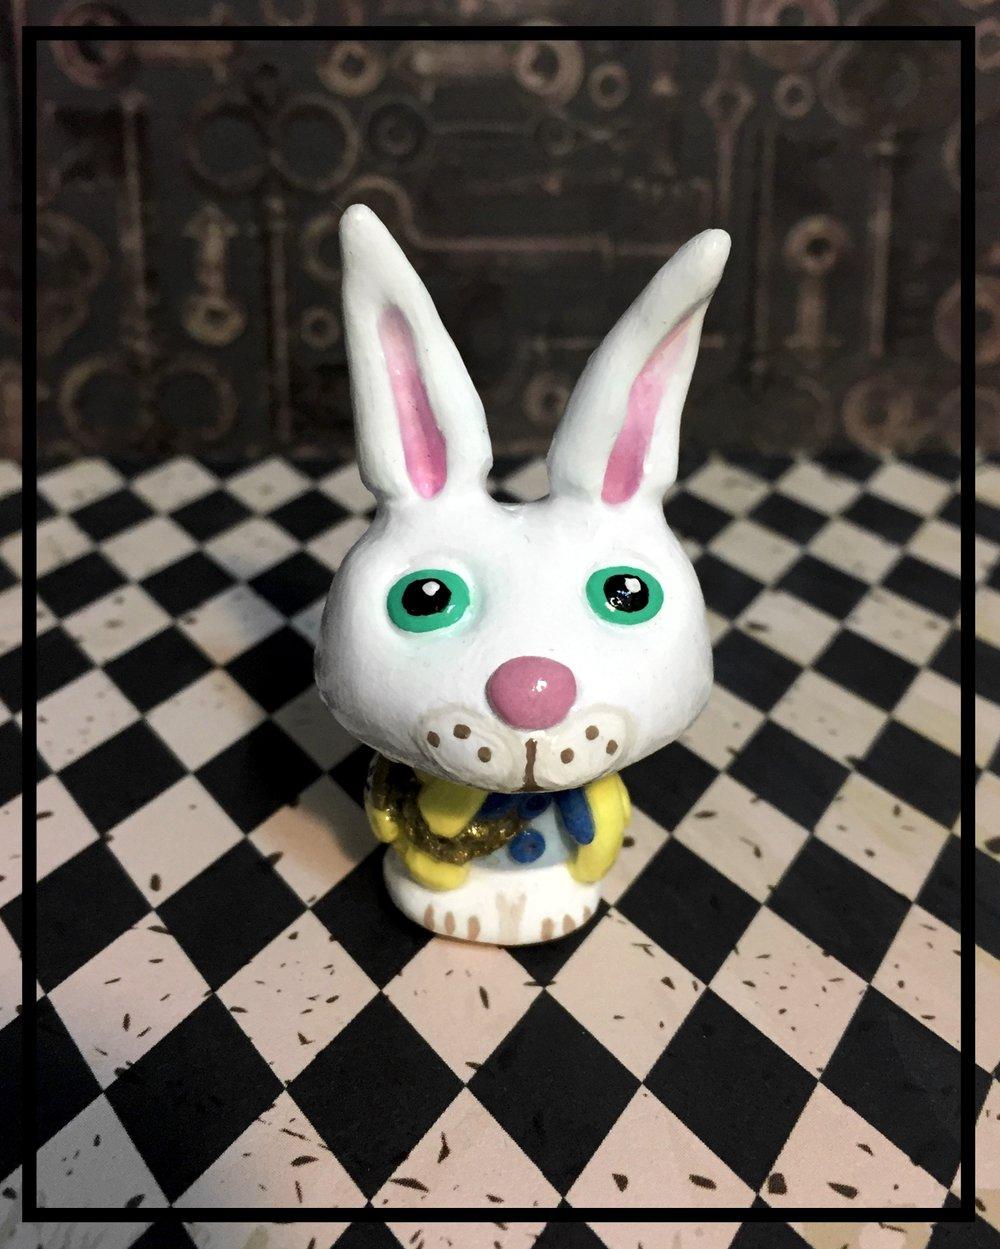 The White Rabbit 'Shroom Sculpture